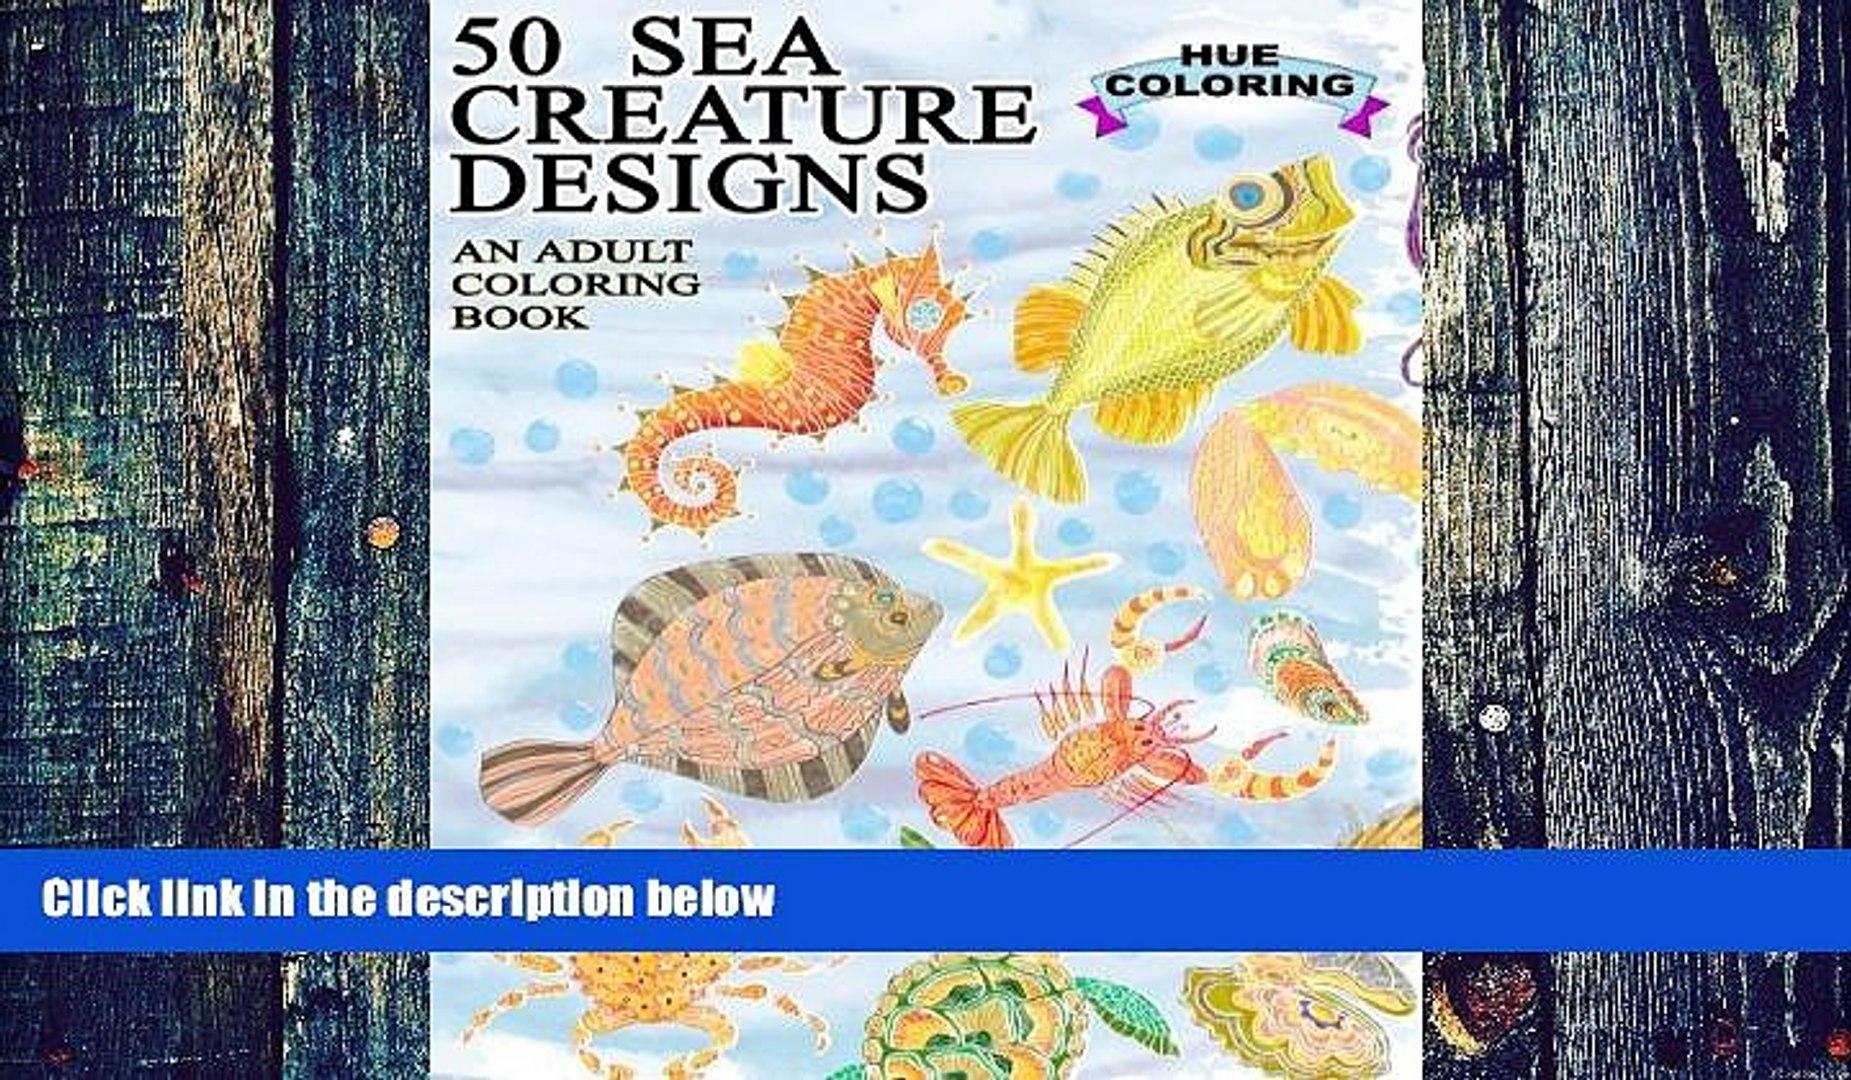 Buy Elisabeth Huffman 50 Sea Creature Designs An Adult Coloring Book Full Ebook